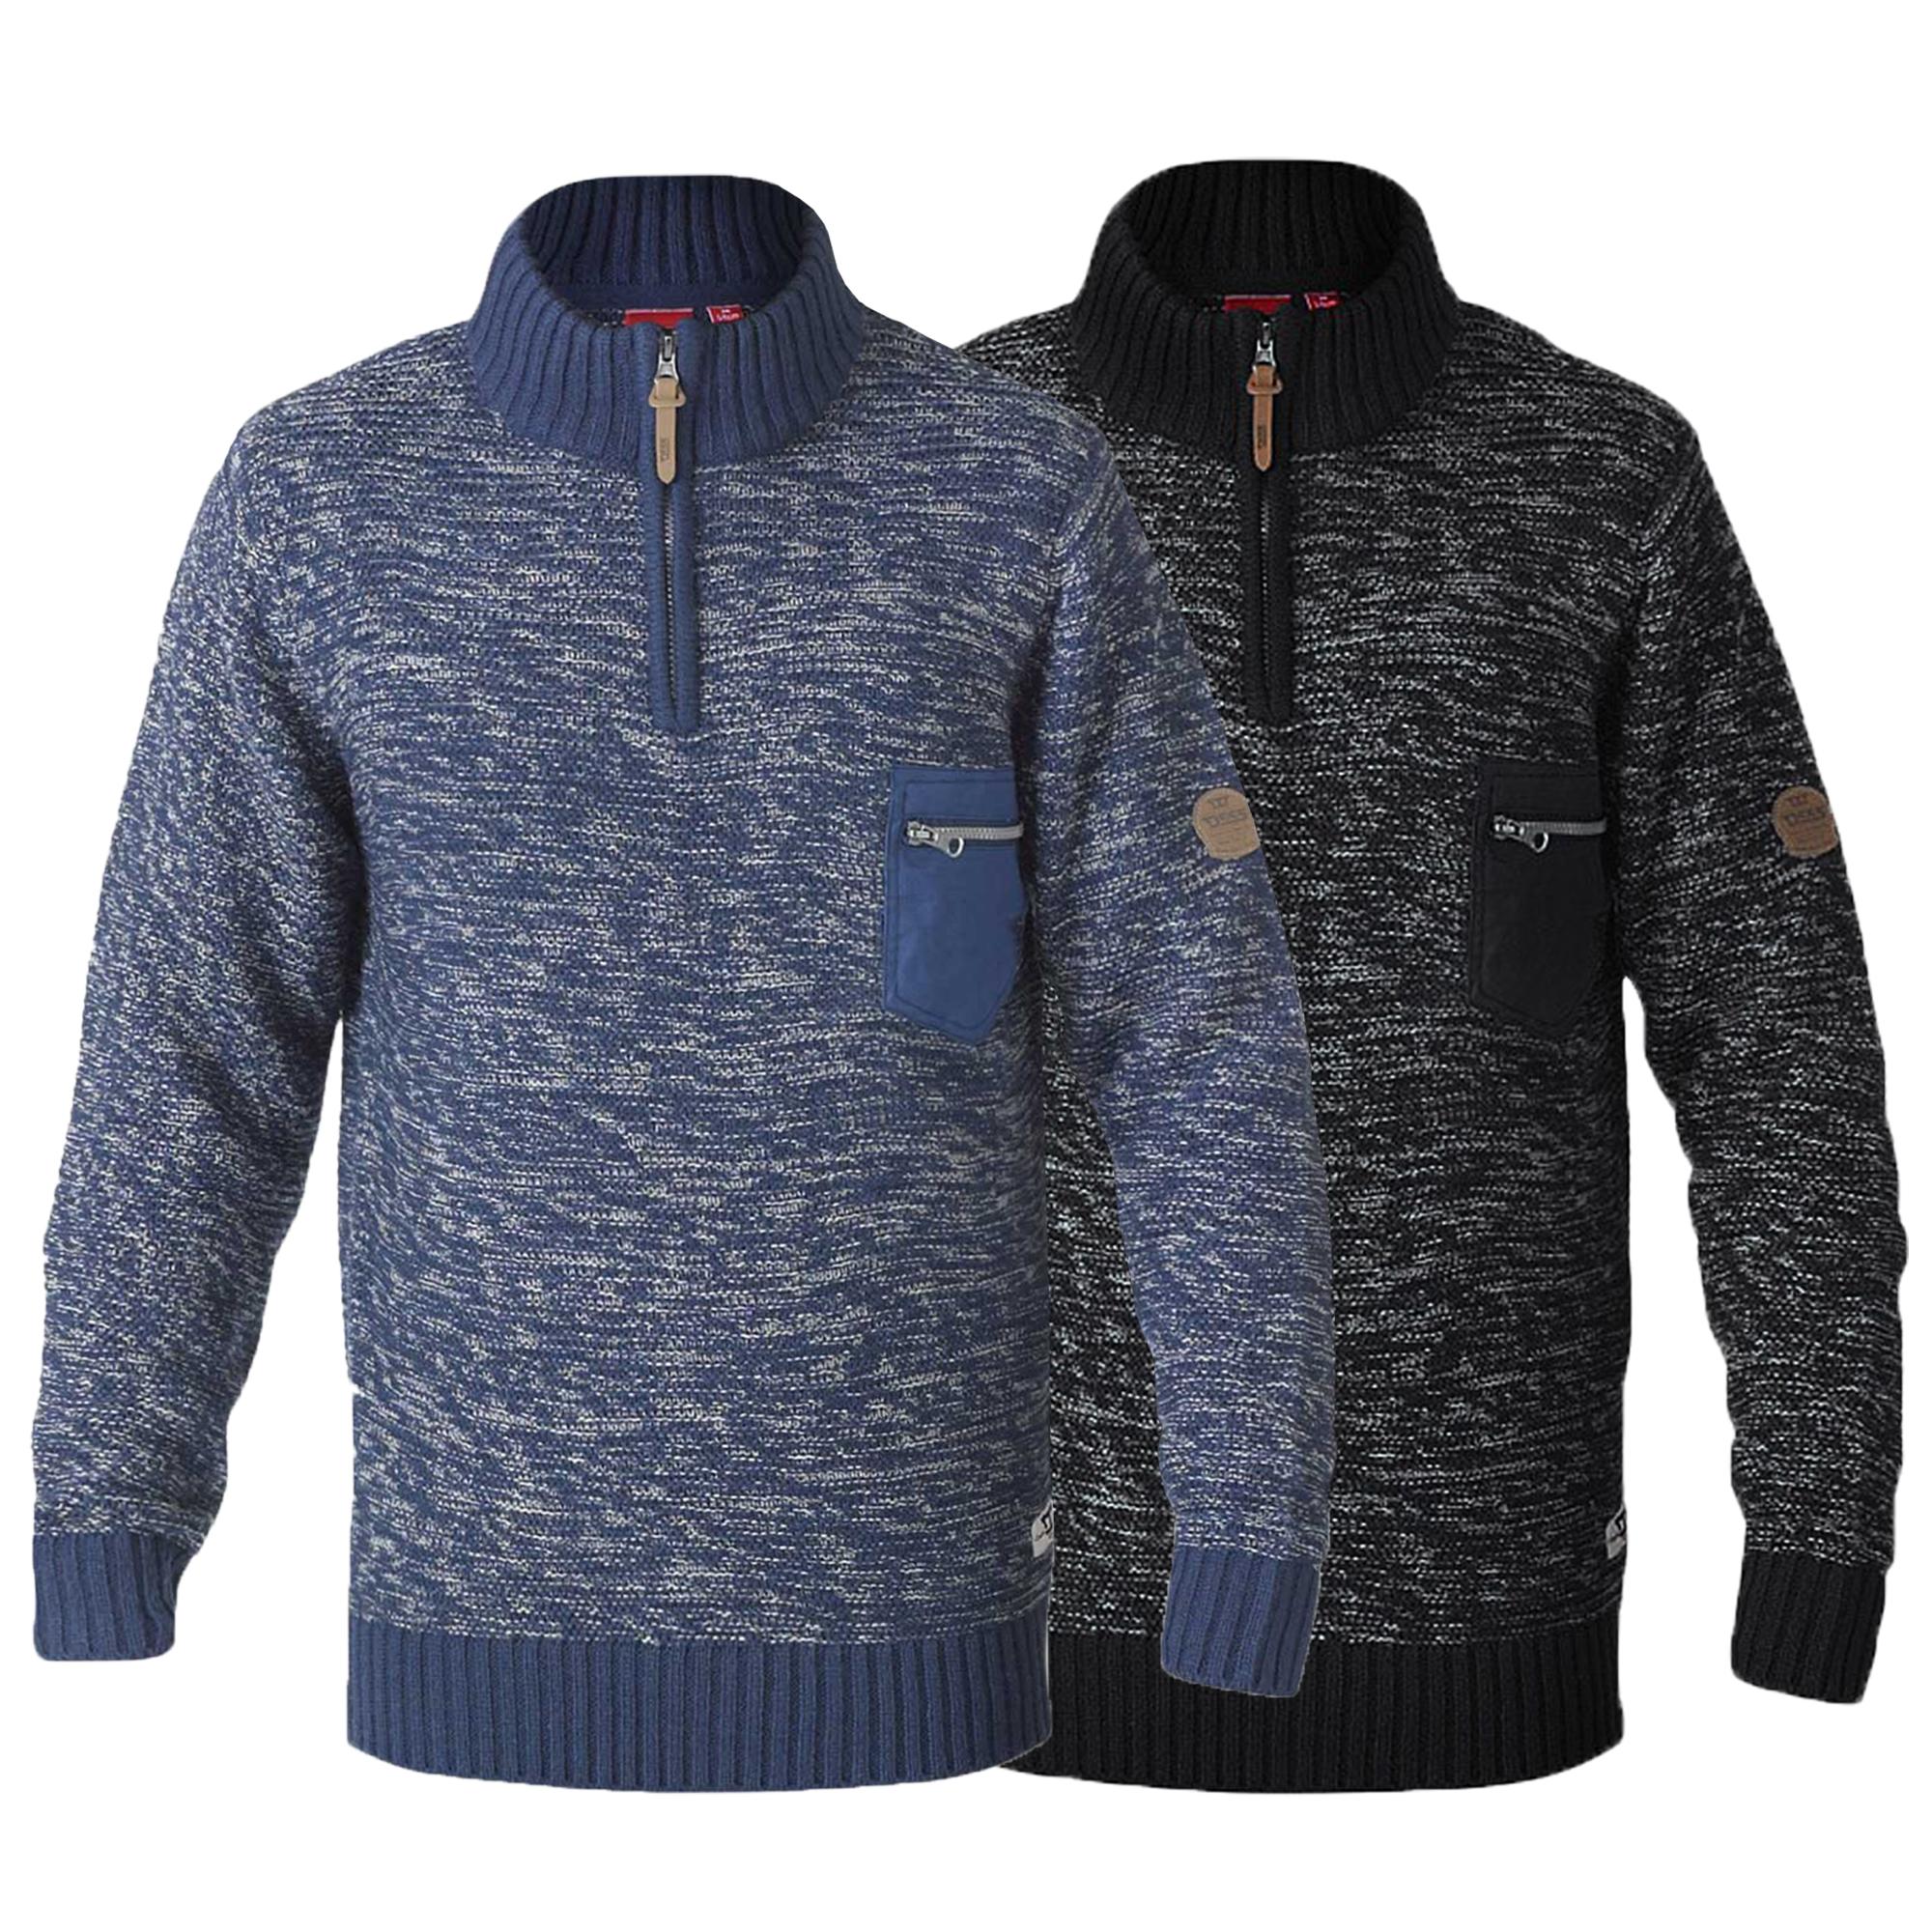 Mens-Jumper-D555-Duke-Big-King-Size-Knitted-Sweater-Pullover-Zip-Top-Winter-Warm thumbnail 3